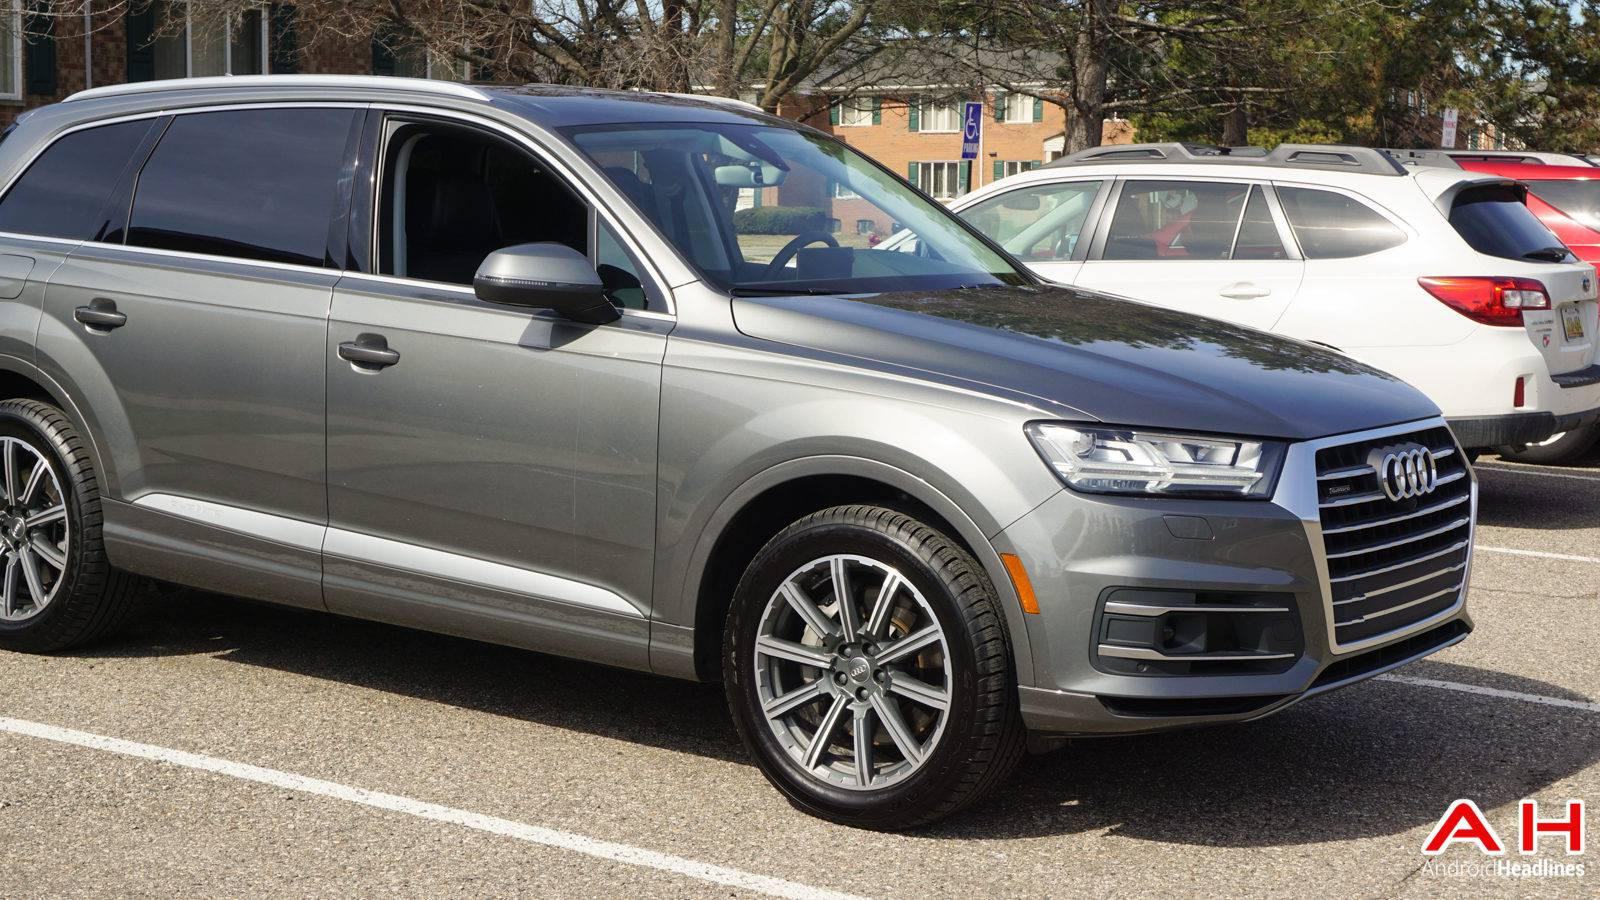 2017-Audi-Q7-Hands-On-AH-00028